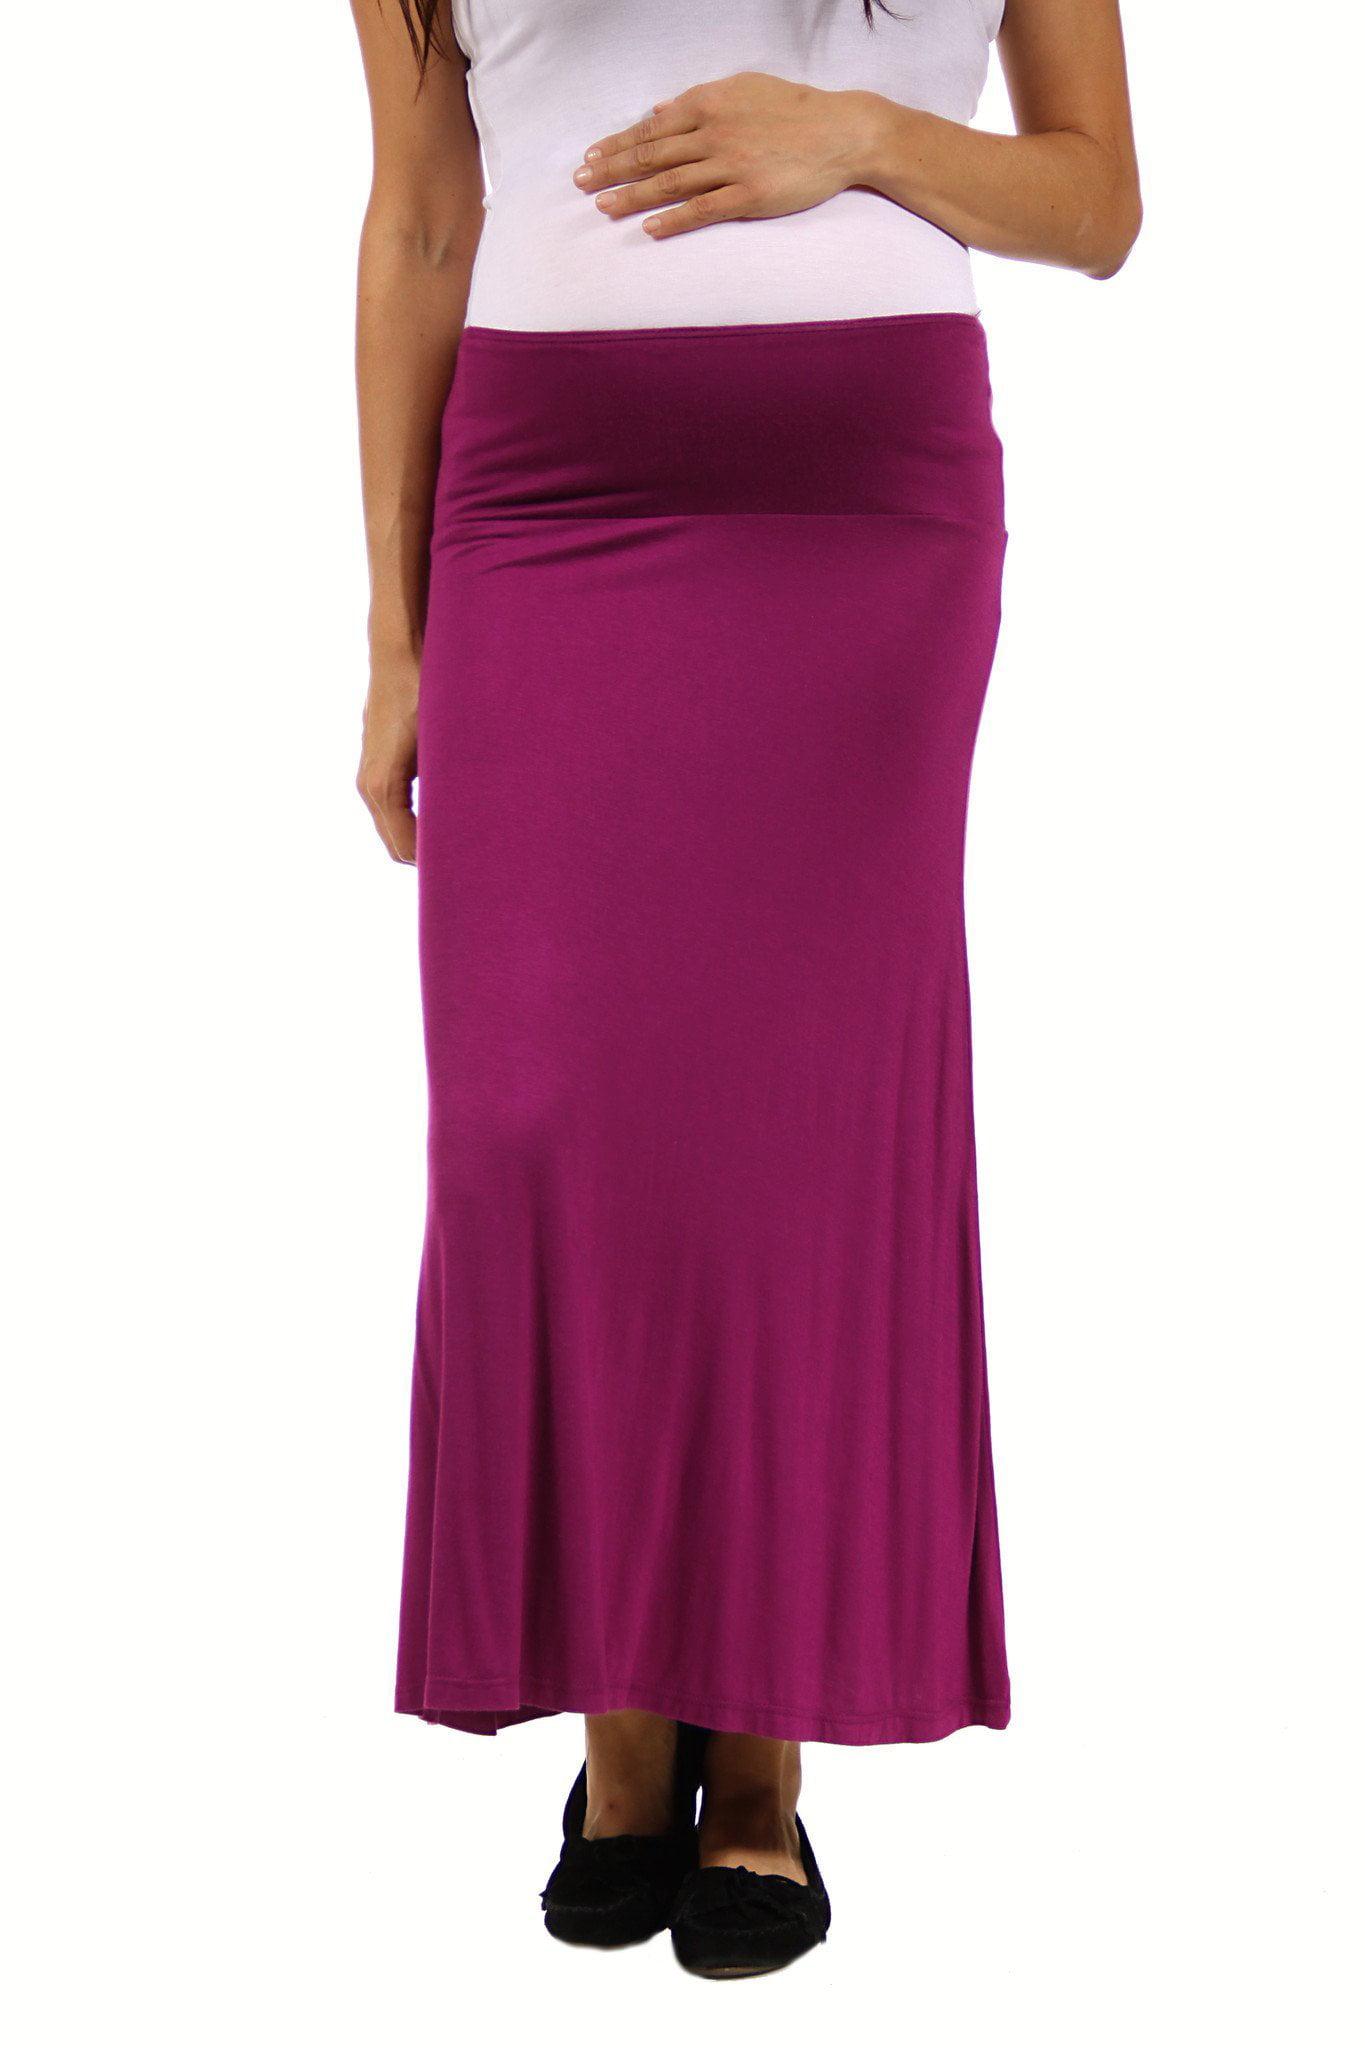 24seven Comfort Apparel Women's Maternity Comfortable Elastic Waist Maxi Skirt by